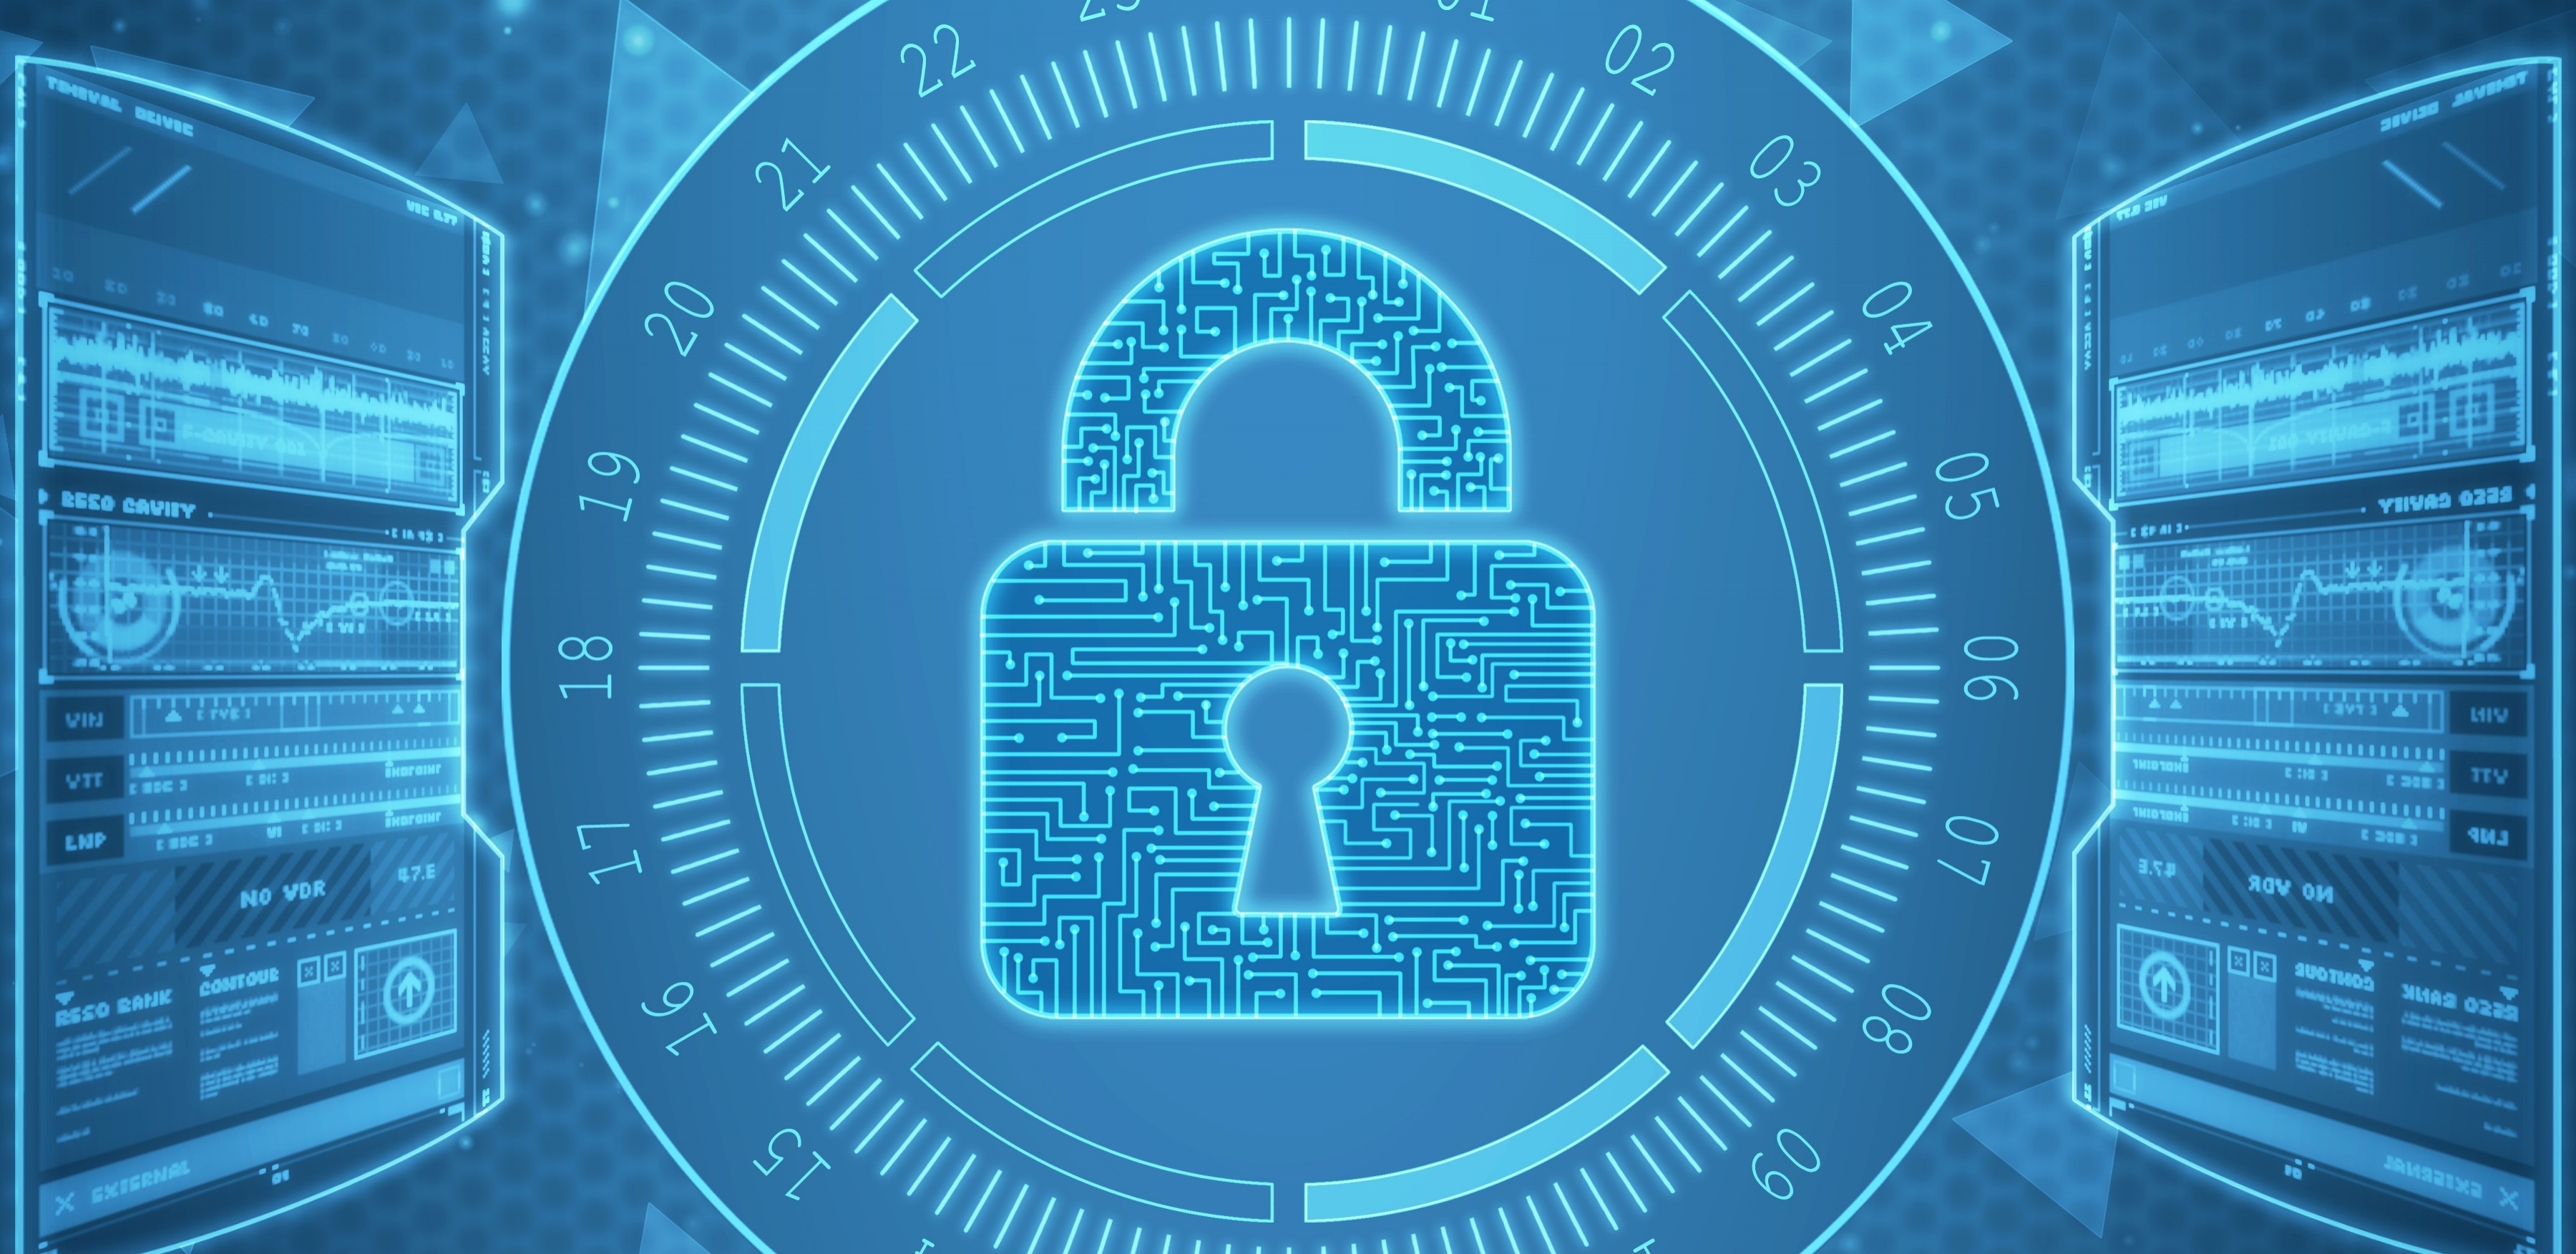 Internal-Security-Tools-Management-970194-edited.jpg